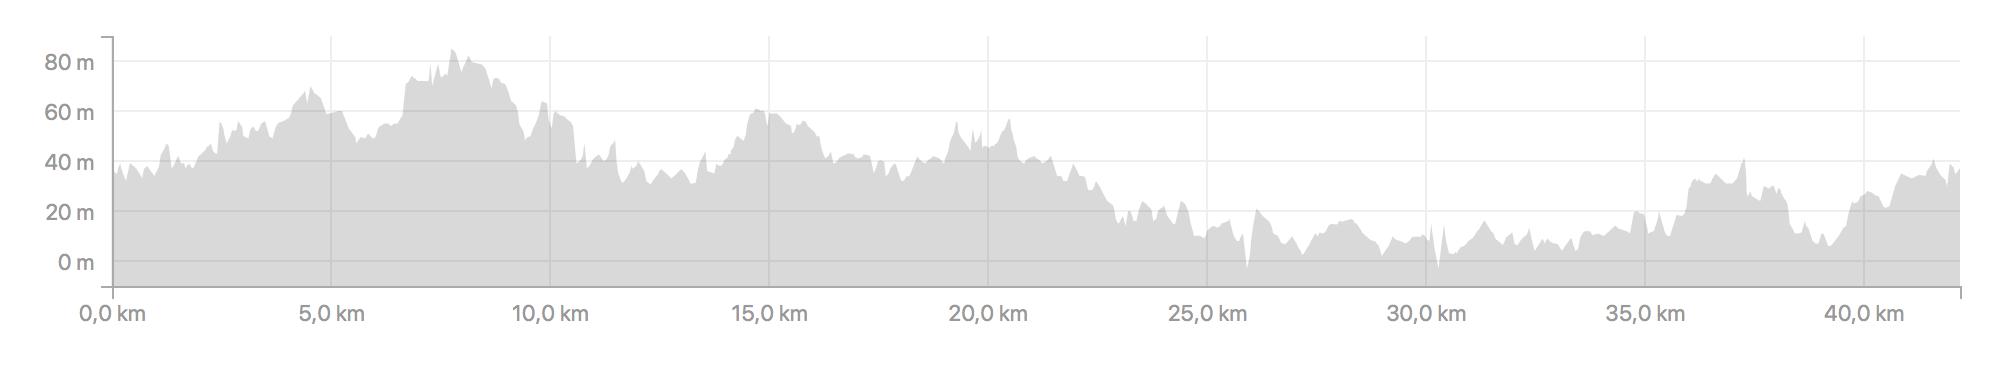 Profile of the Barcelona Marathon